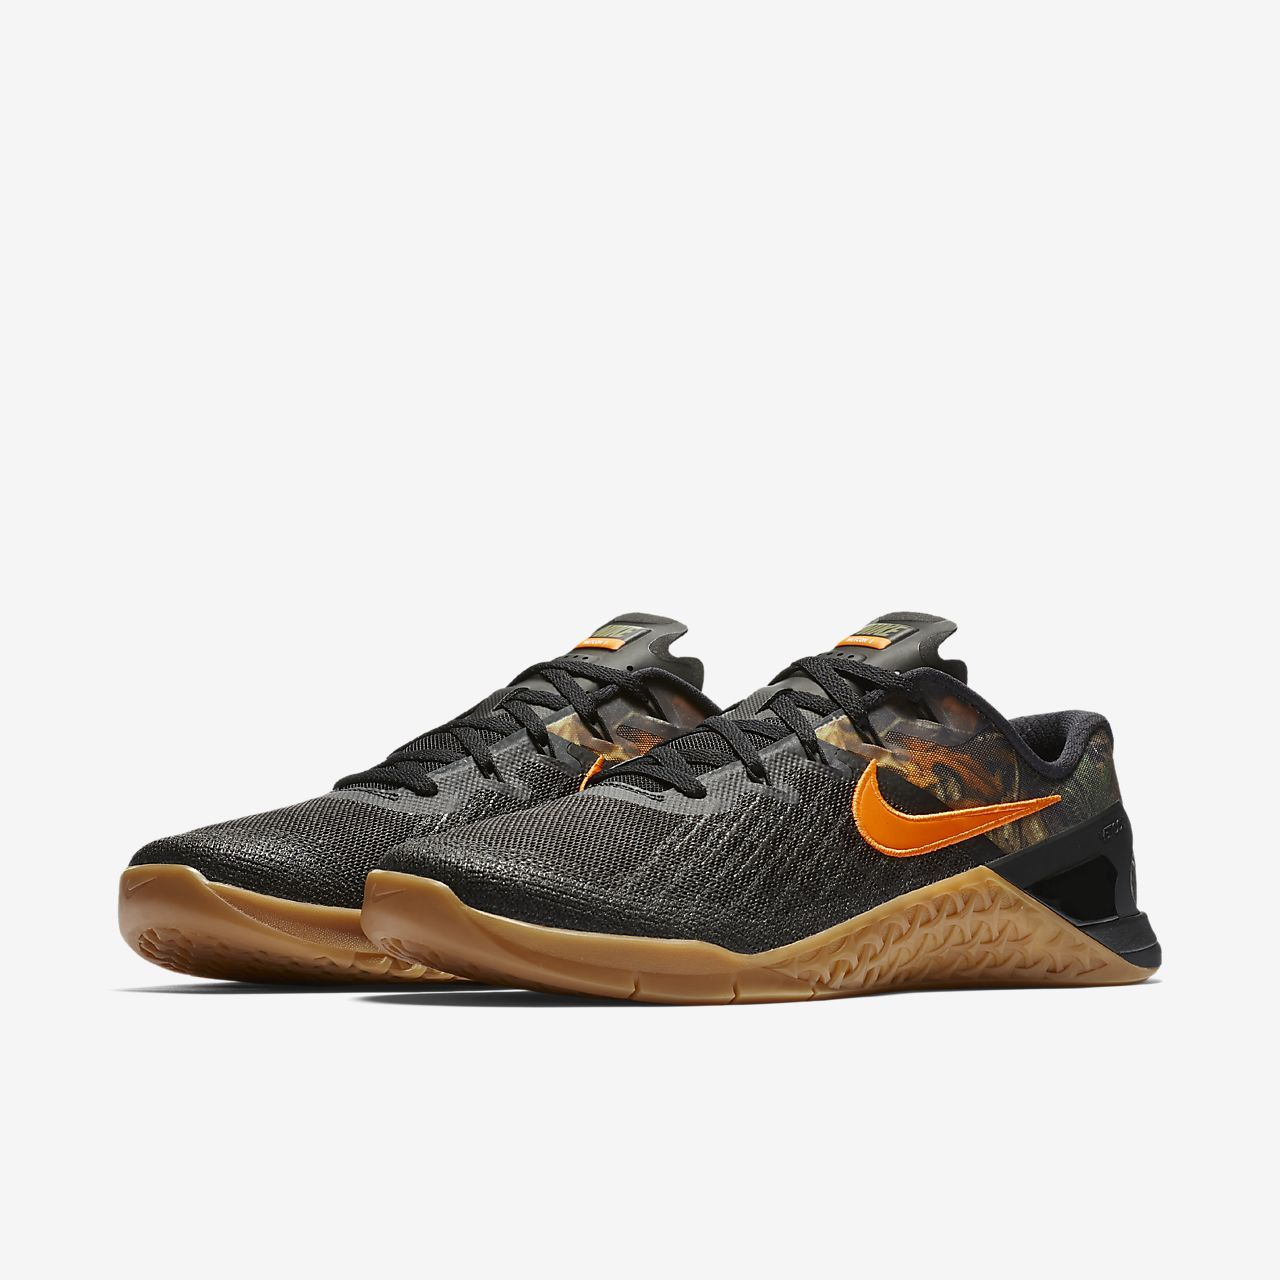 Nike Metcon 3 Realtree Men's Training